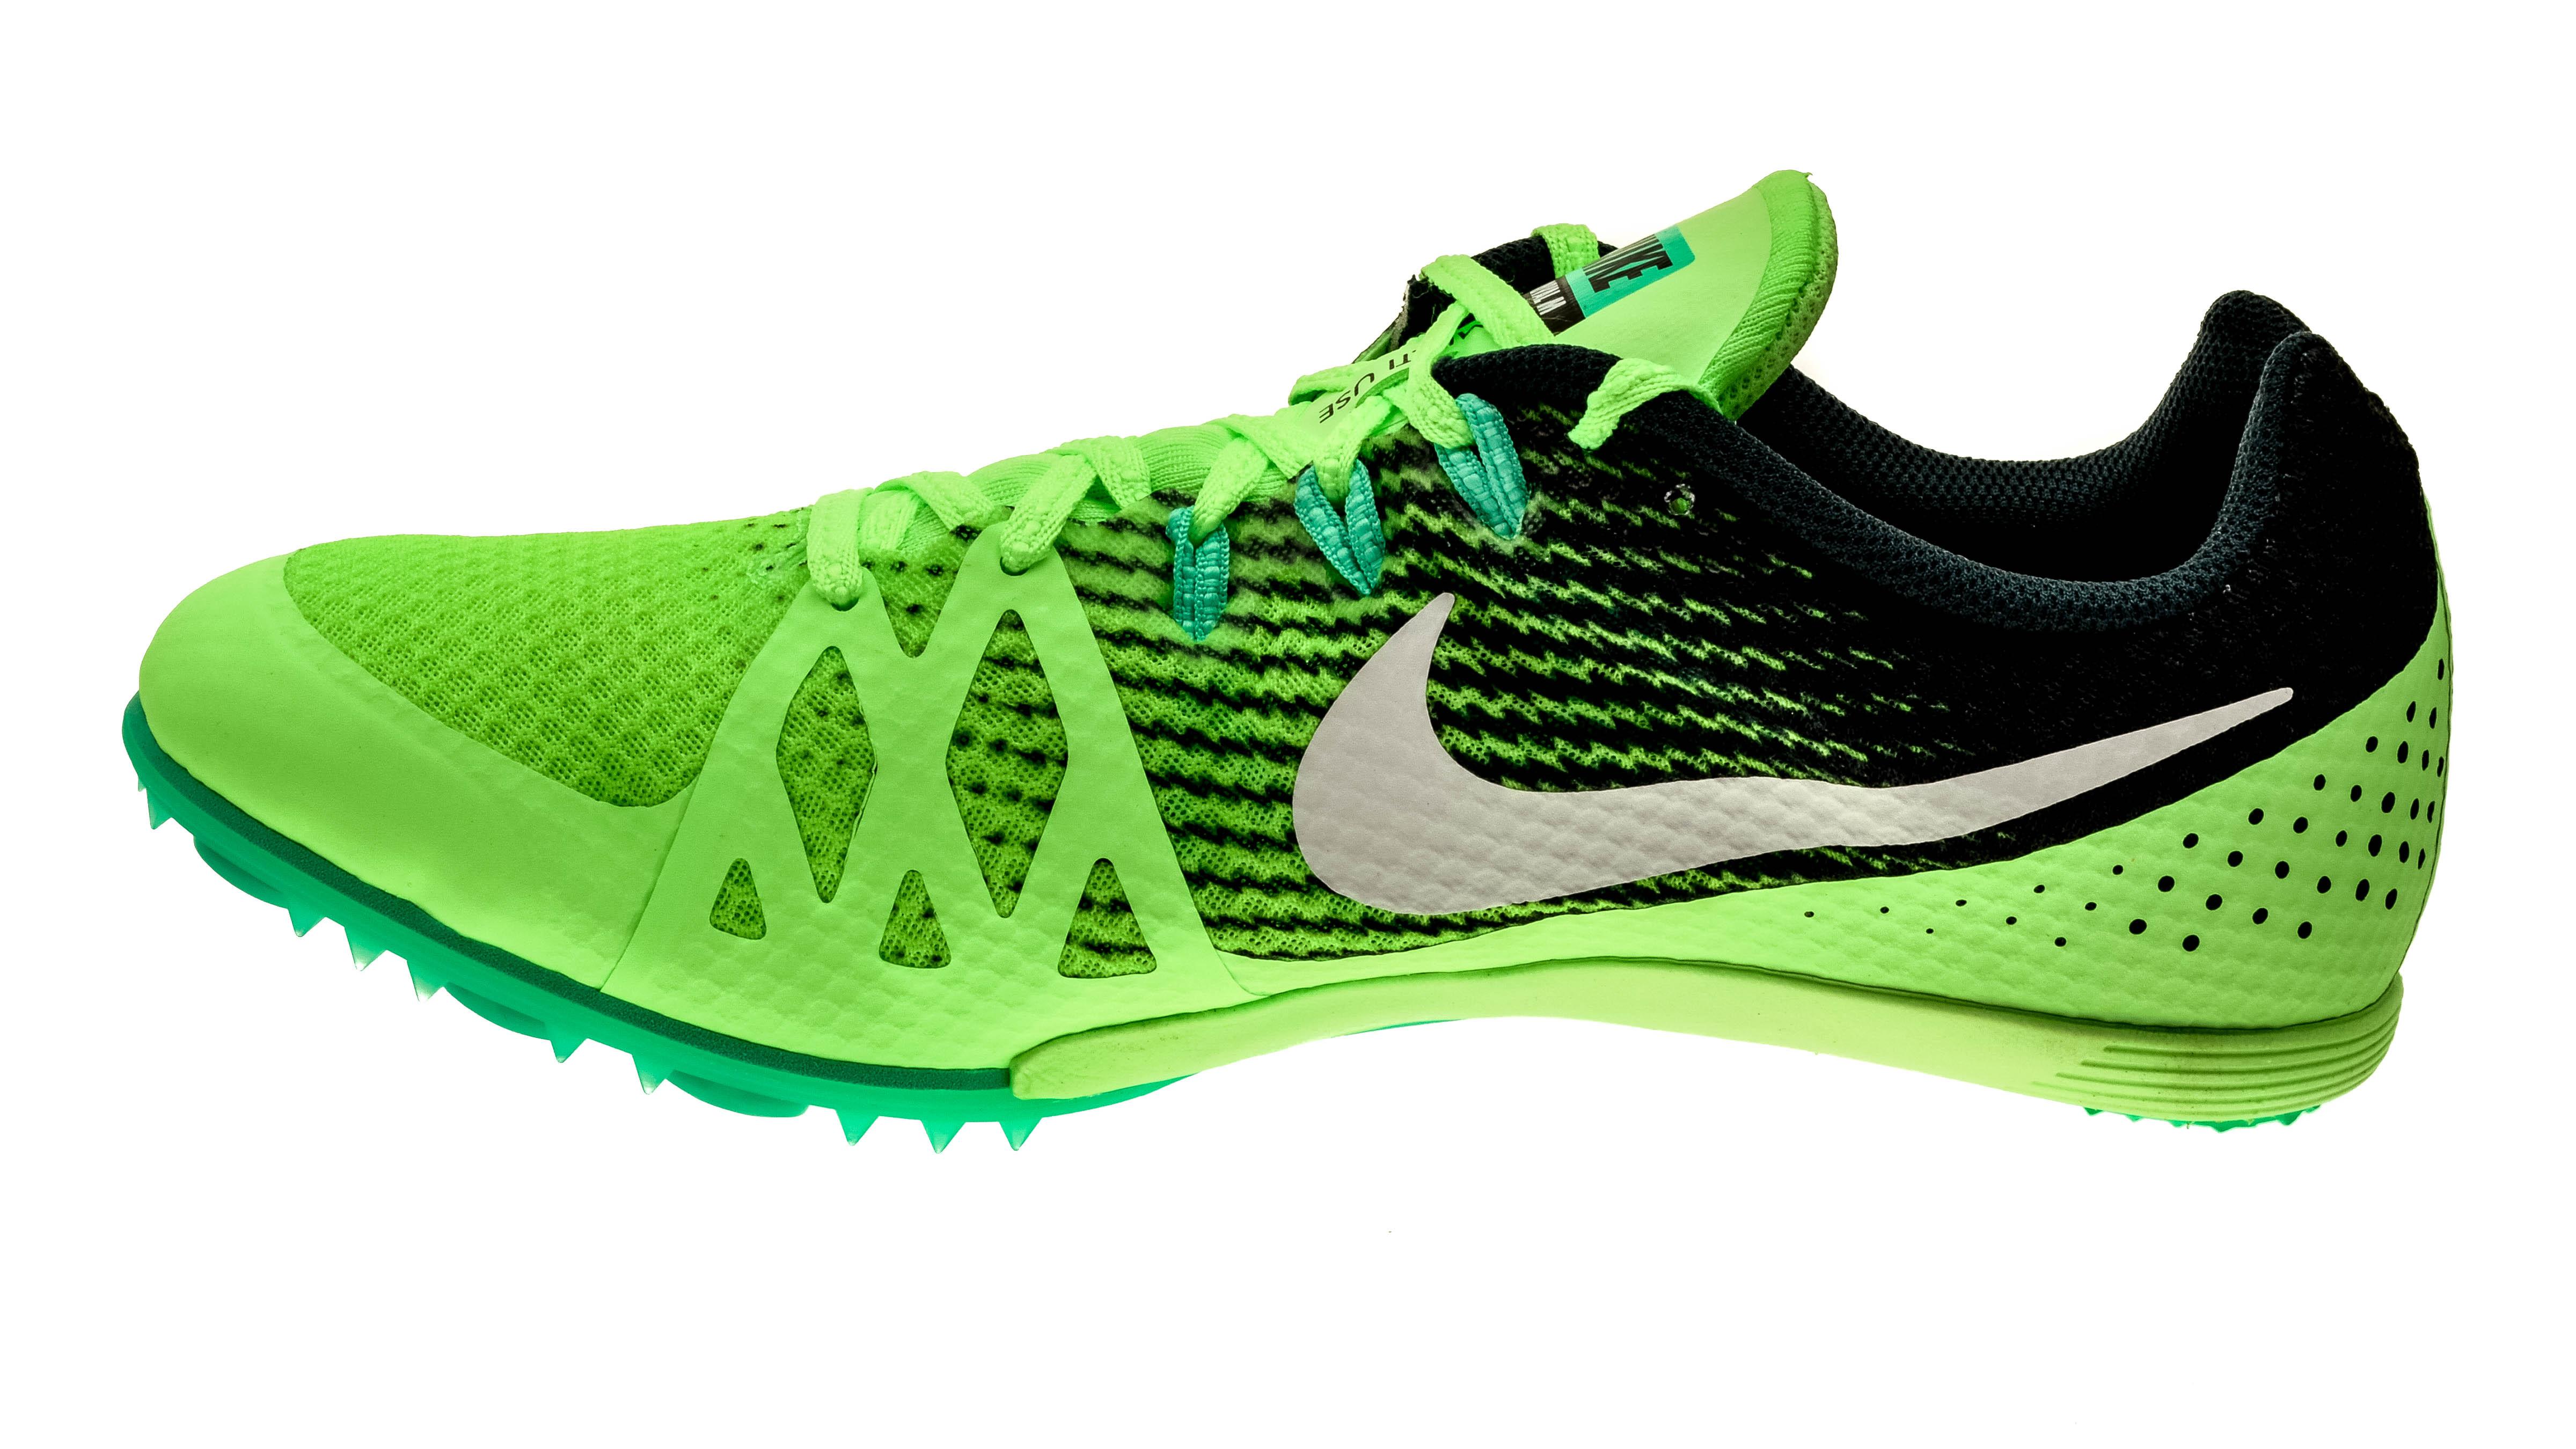 filtrar dispersión no usado  Nike Zoom Rival M8 ghost-green/white-seaweed/green [unisex]